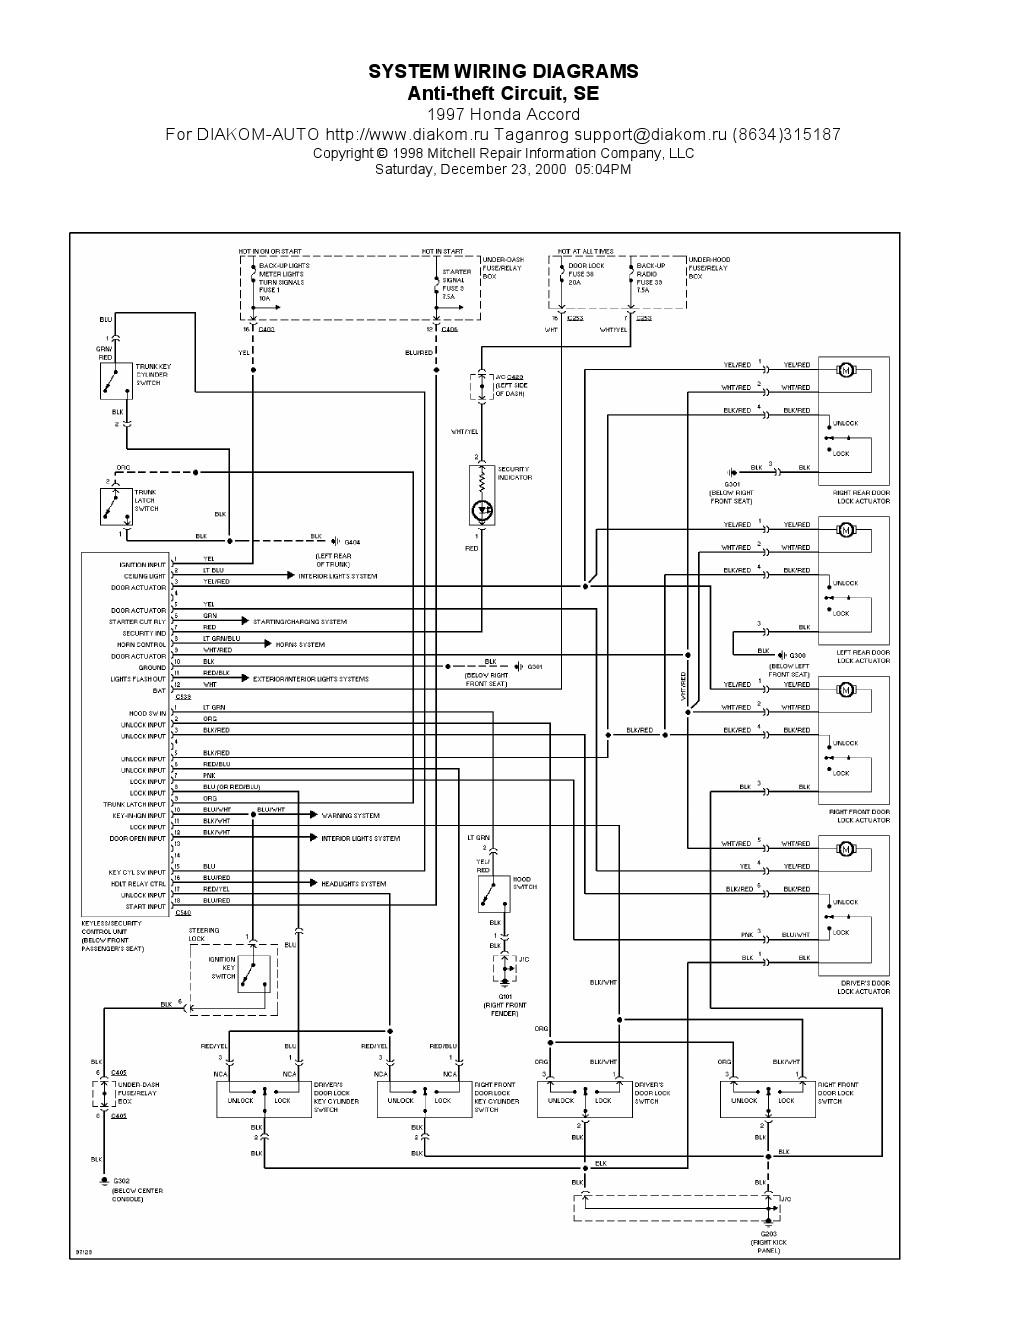 2003 Honda Civic Fuse Box Location P - Free Wiring Diagram For You on 2006 honda ridgeline wiring diagram, 1993 honda accord wiring diagram, 1997 honda passport wiring diagram, 2002 honda crv wiring diagram, 2003 toyota prius hybrid wiring diagram, 2007 honda element wiring diagram, 2003 gmc sierra 2500hd wiring diagram, 2003 hyundai xg350 wiring diagram, honda accord wiring harness diagram, honda accord radio diagram, 2007 pontiac grand prix wiring diagram, 2007 honda cr-v wiring diagram, 2014 honda accord wiring diagram, 2007 honda accord wiring diagram, 2002 audi a4 wiring diagram, 2003 ford super duty wiring diagram, 1985 honda prelude wiring diagram, 2003 jaguar x-type wiring diagram, 2003 lincoln ls wiring diagram, 1997 honda accord starter diagram,